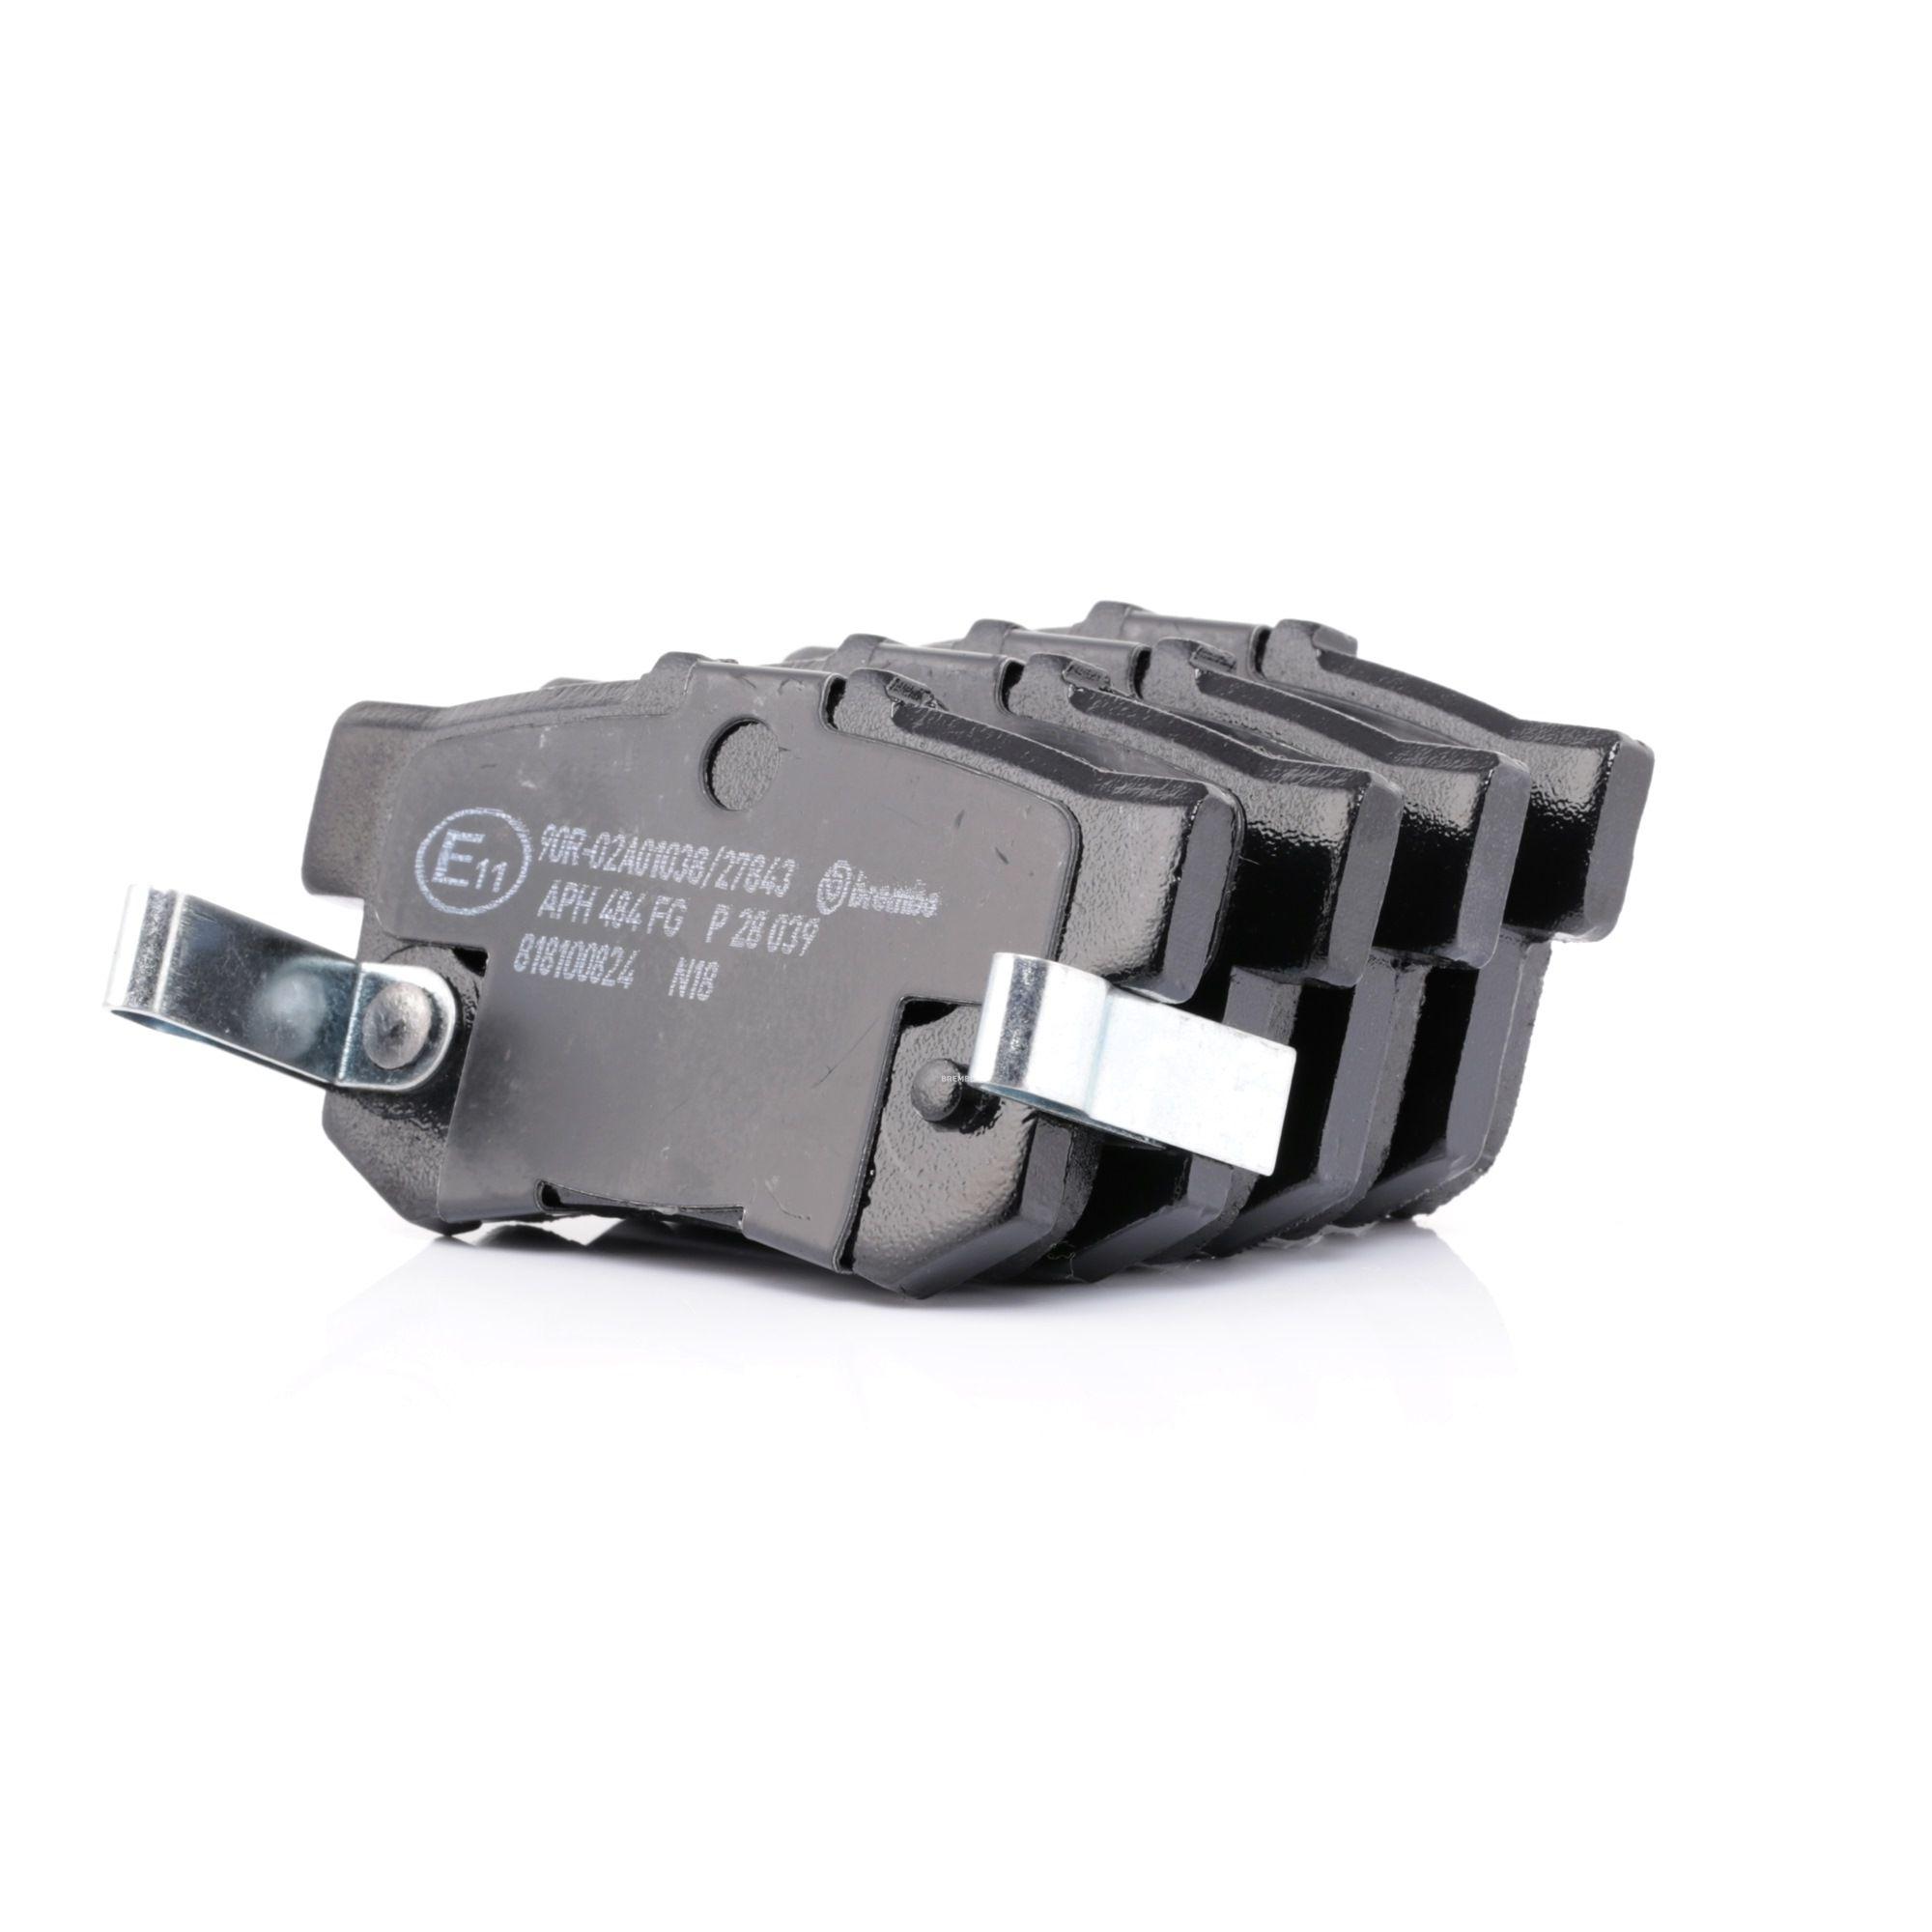 Disk brake pads BREMBO D5377418 rating